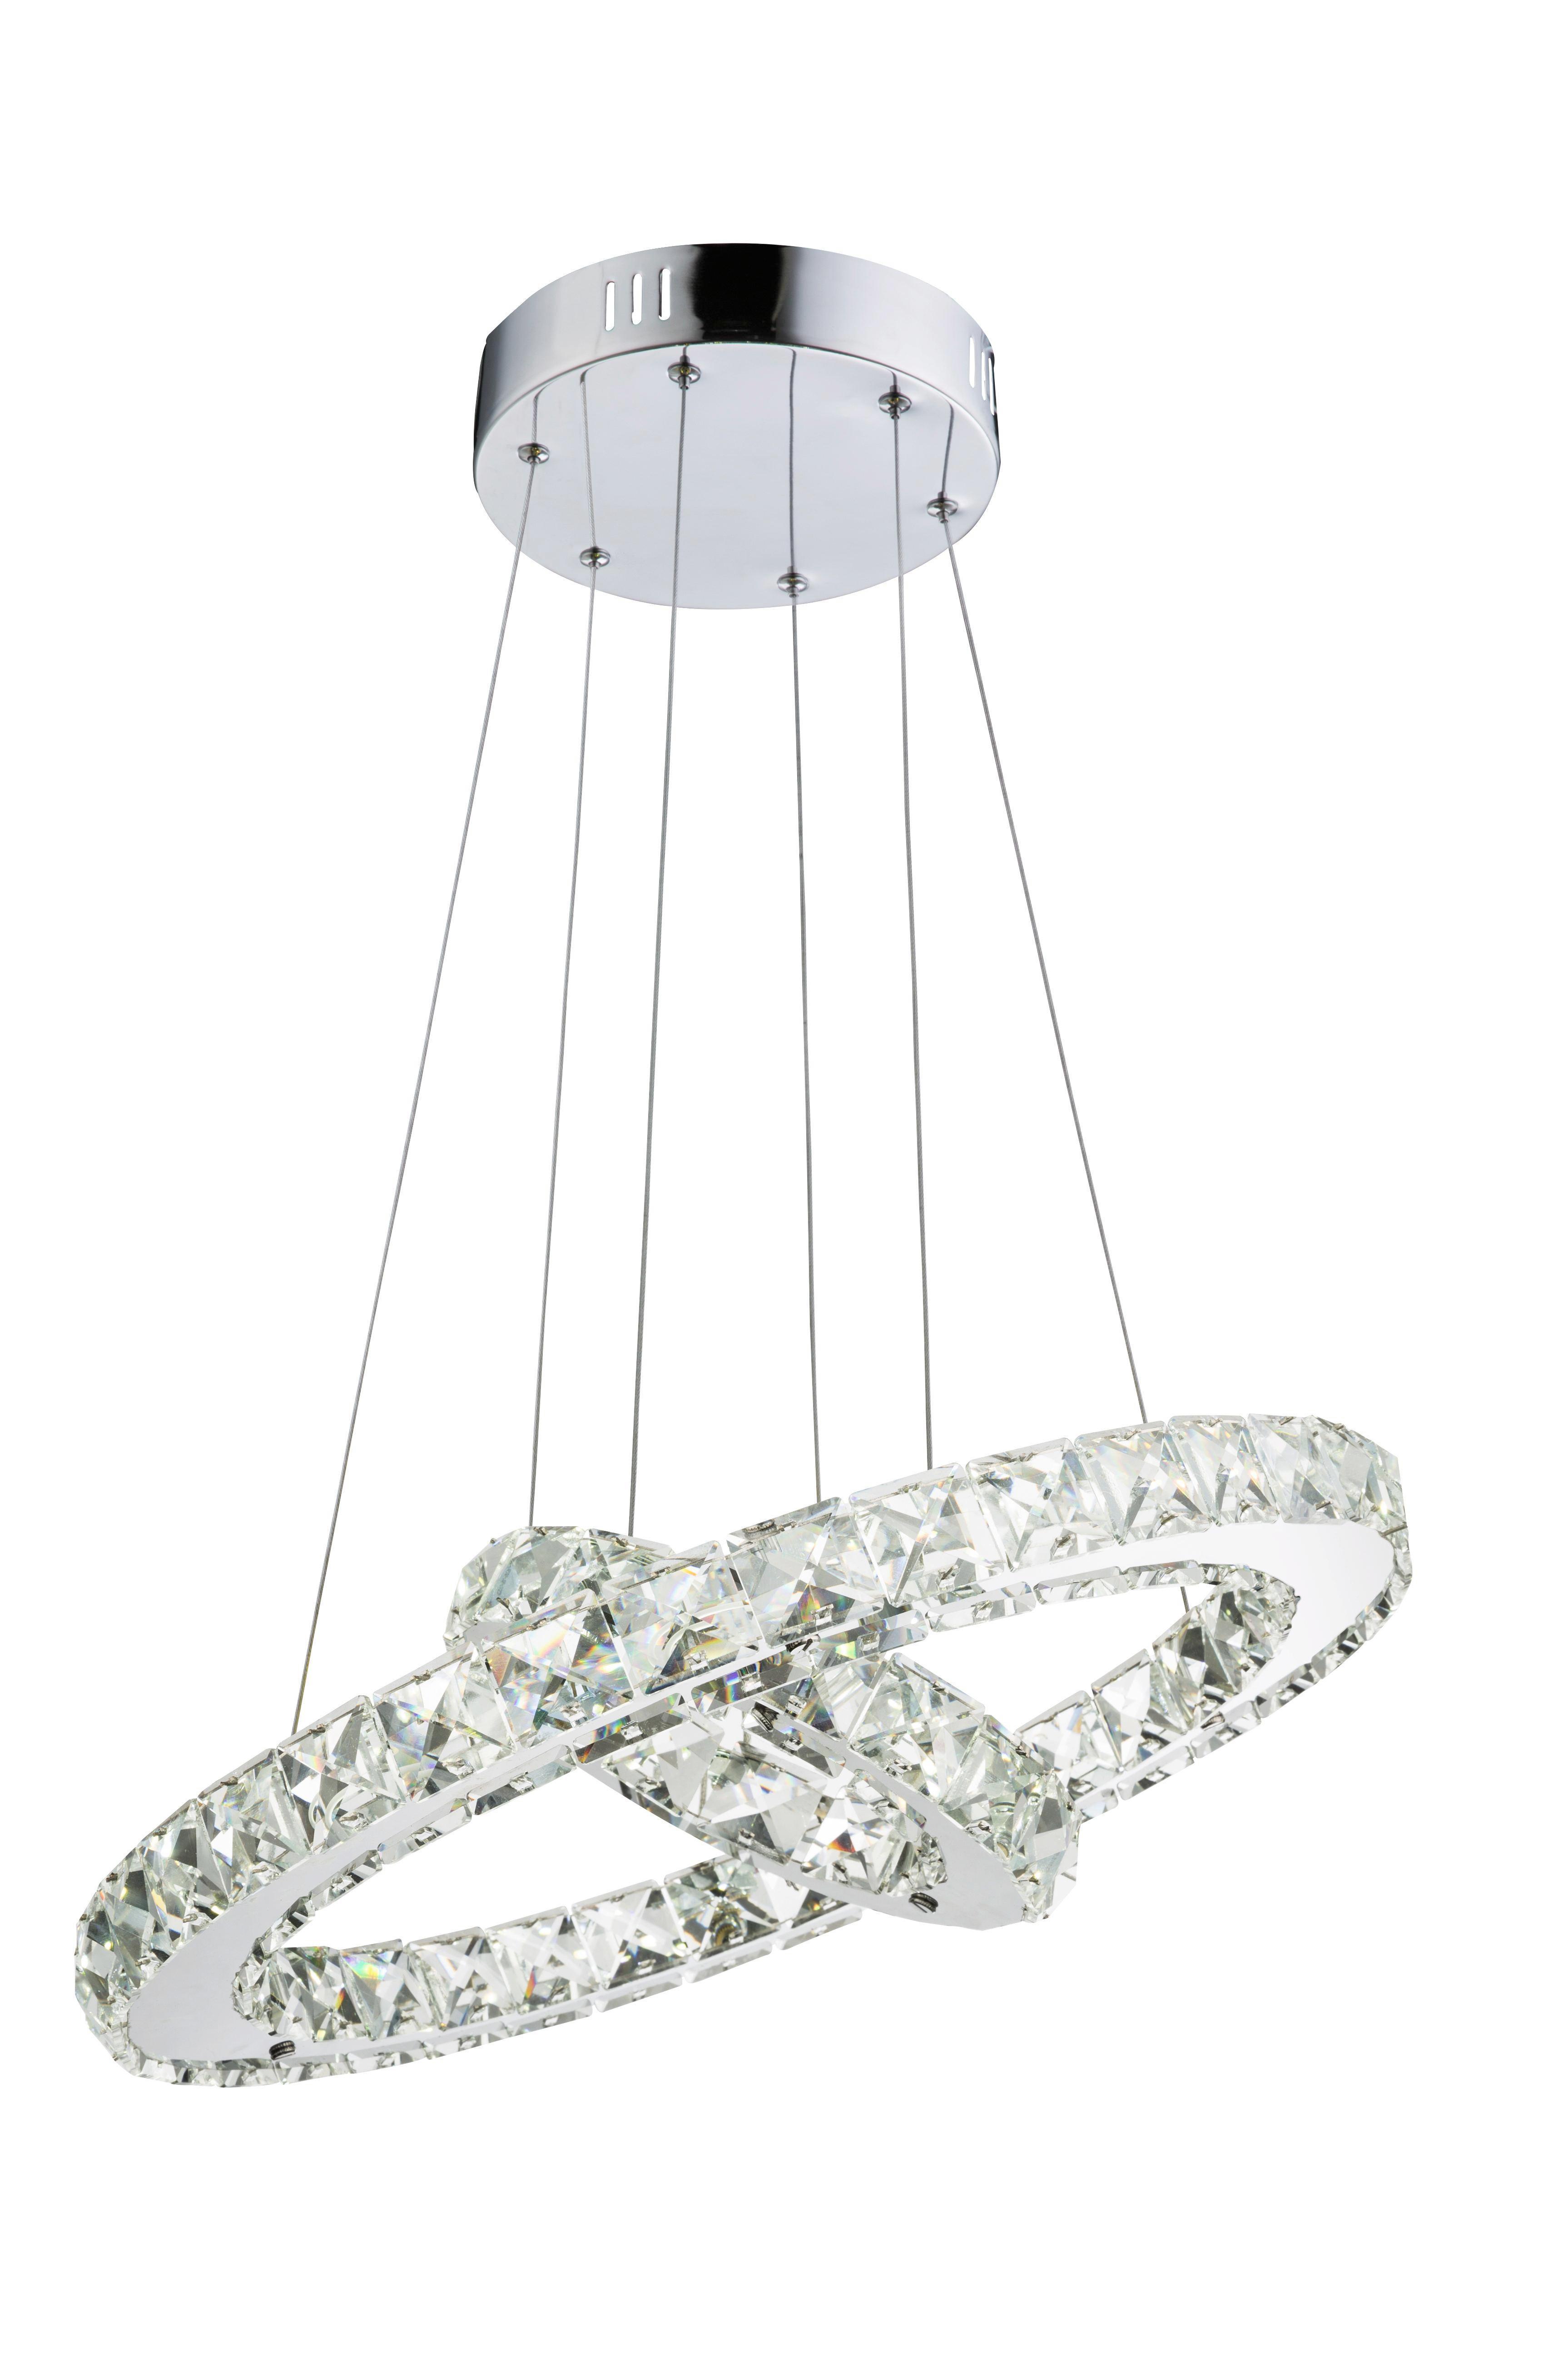 LED-Hängeleuchte Forli, max. 24 Watt - Chromfarben, MODERN, Kunststoff/Metall (40/150cm) - MÖMAX modern living